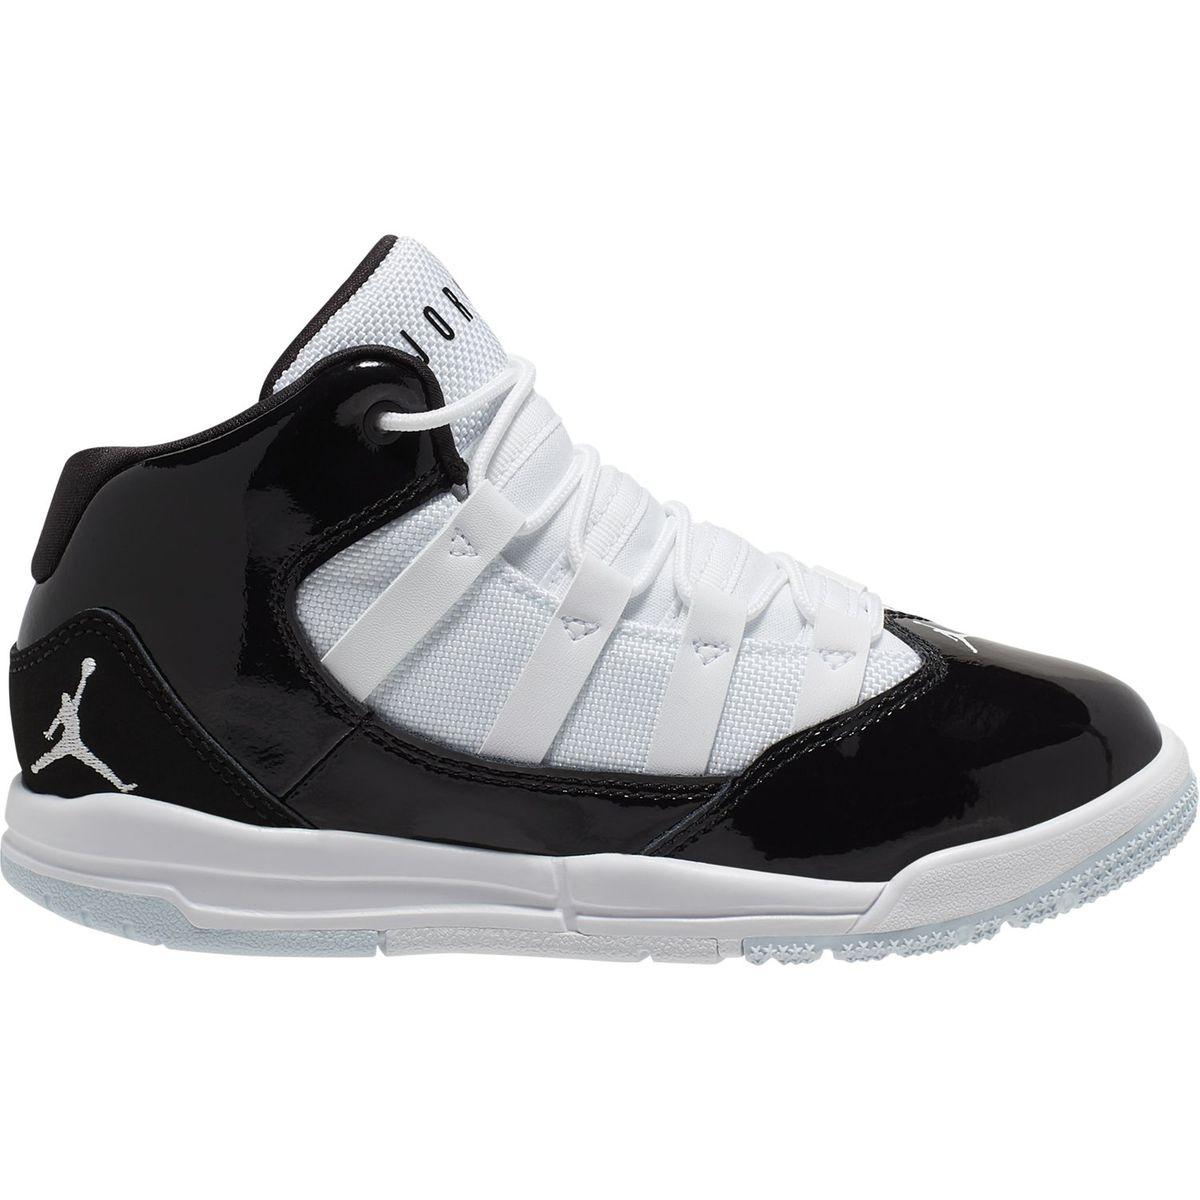 Baskets Jordan Max Aura